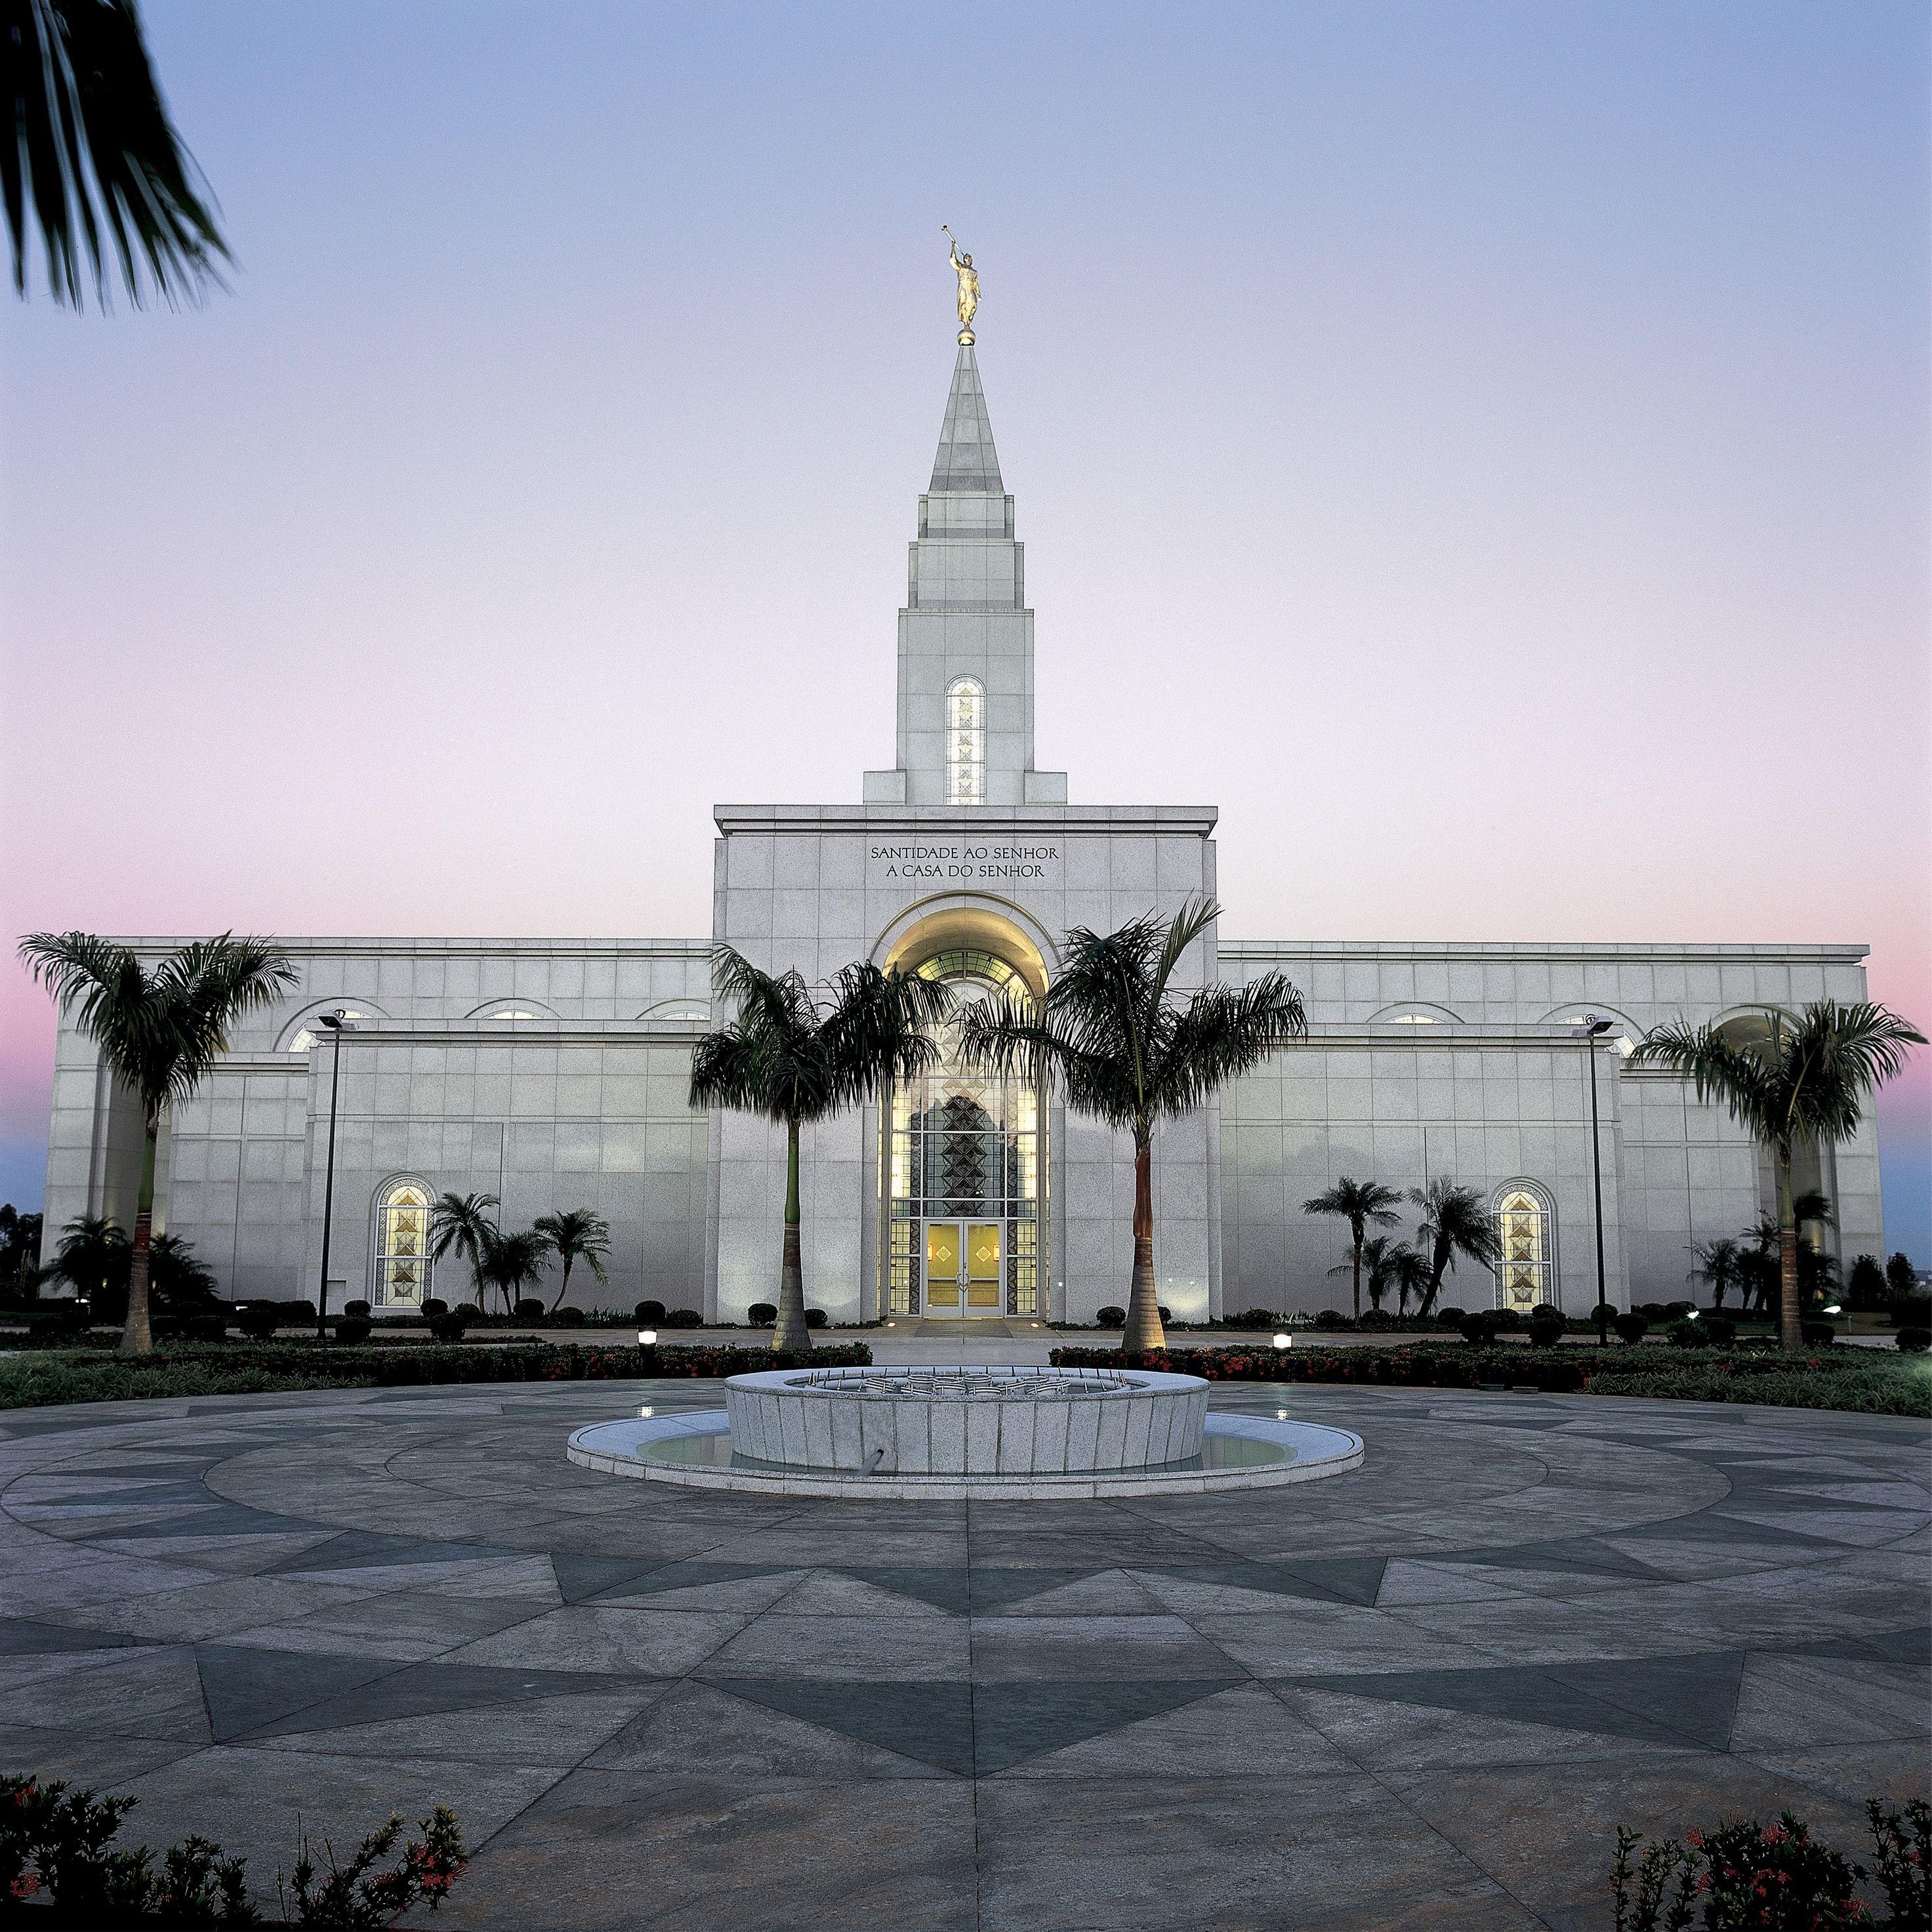 Porto Alegre Lds Temple Templos Mormons Templos Sud Templos